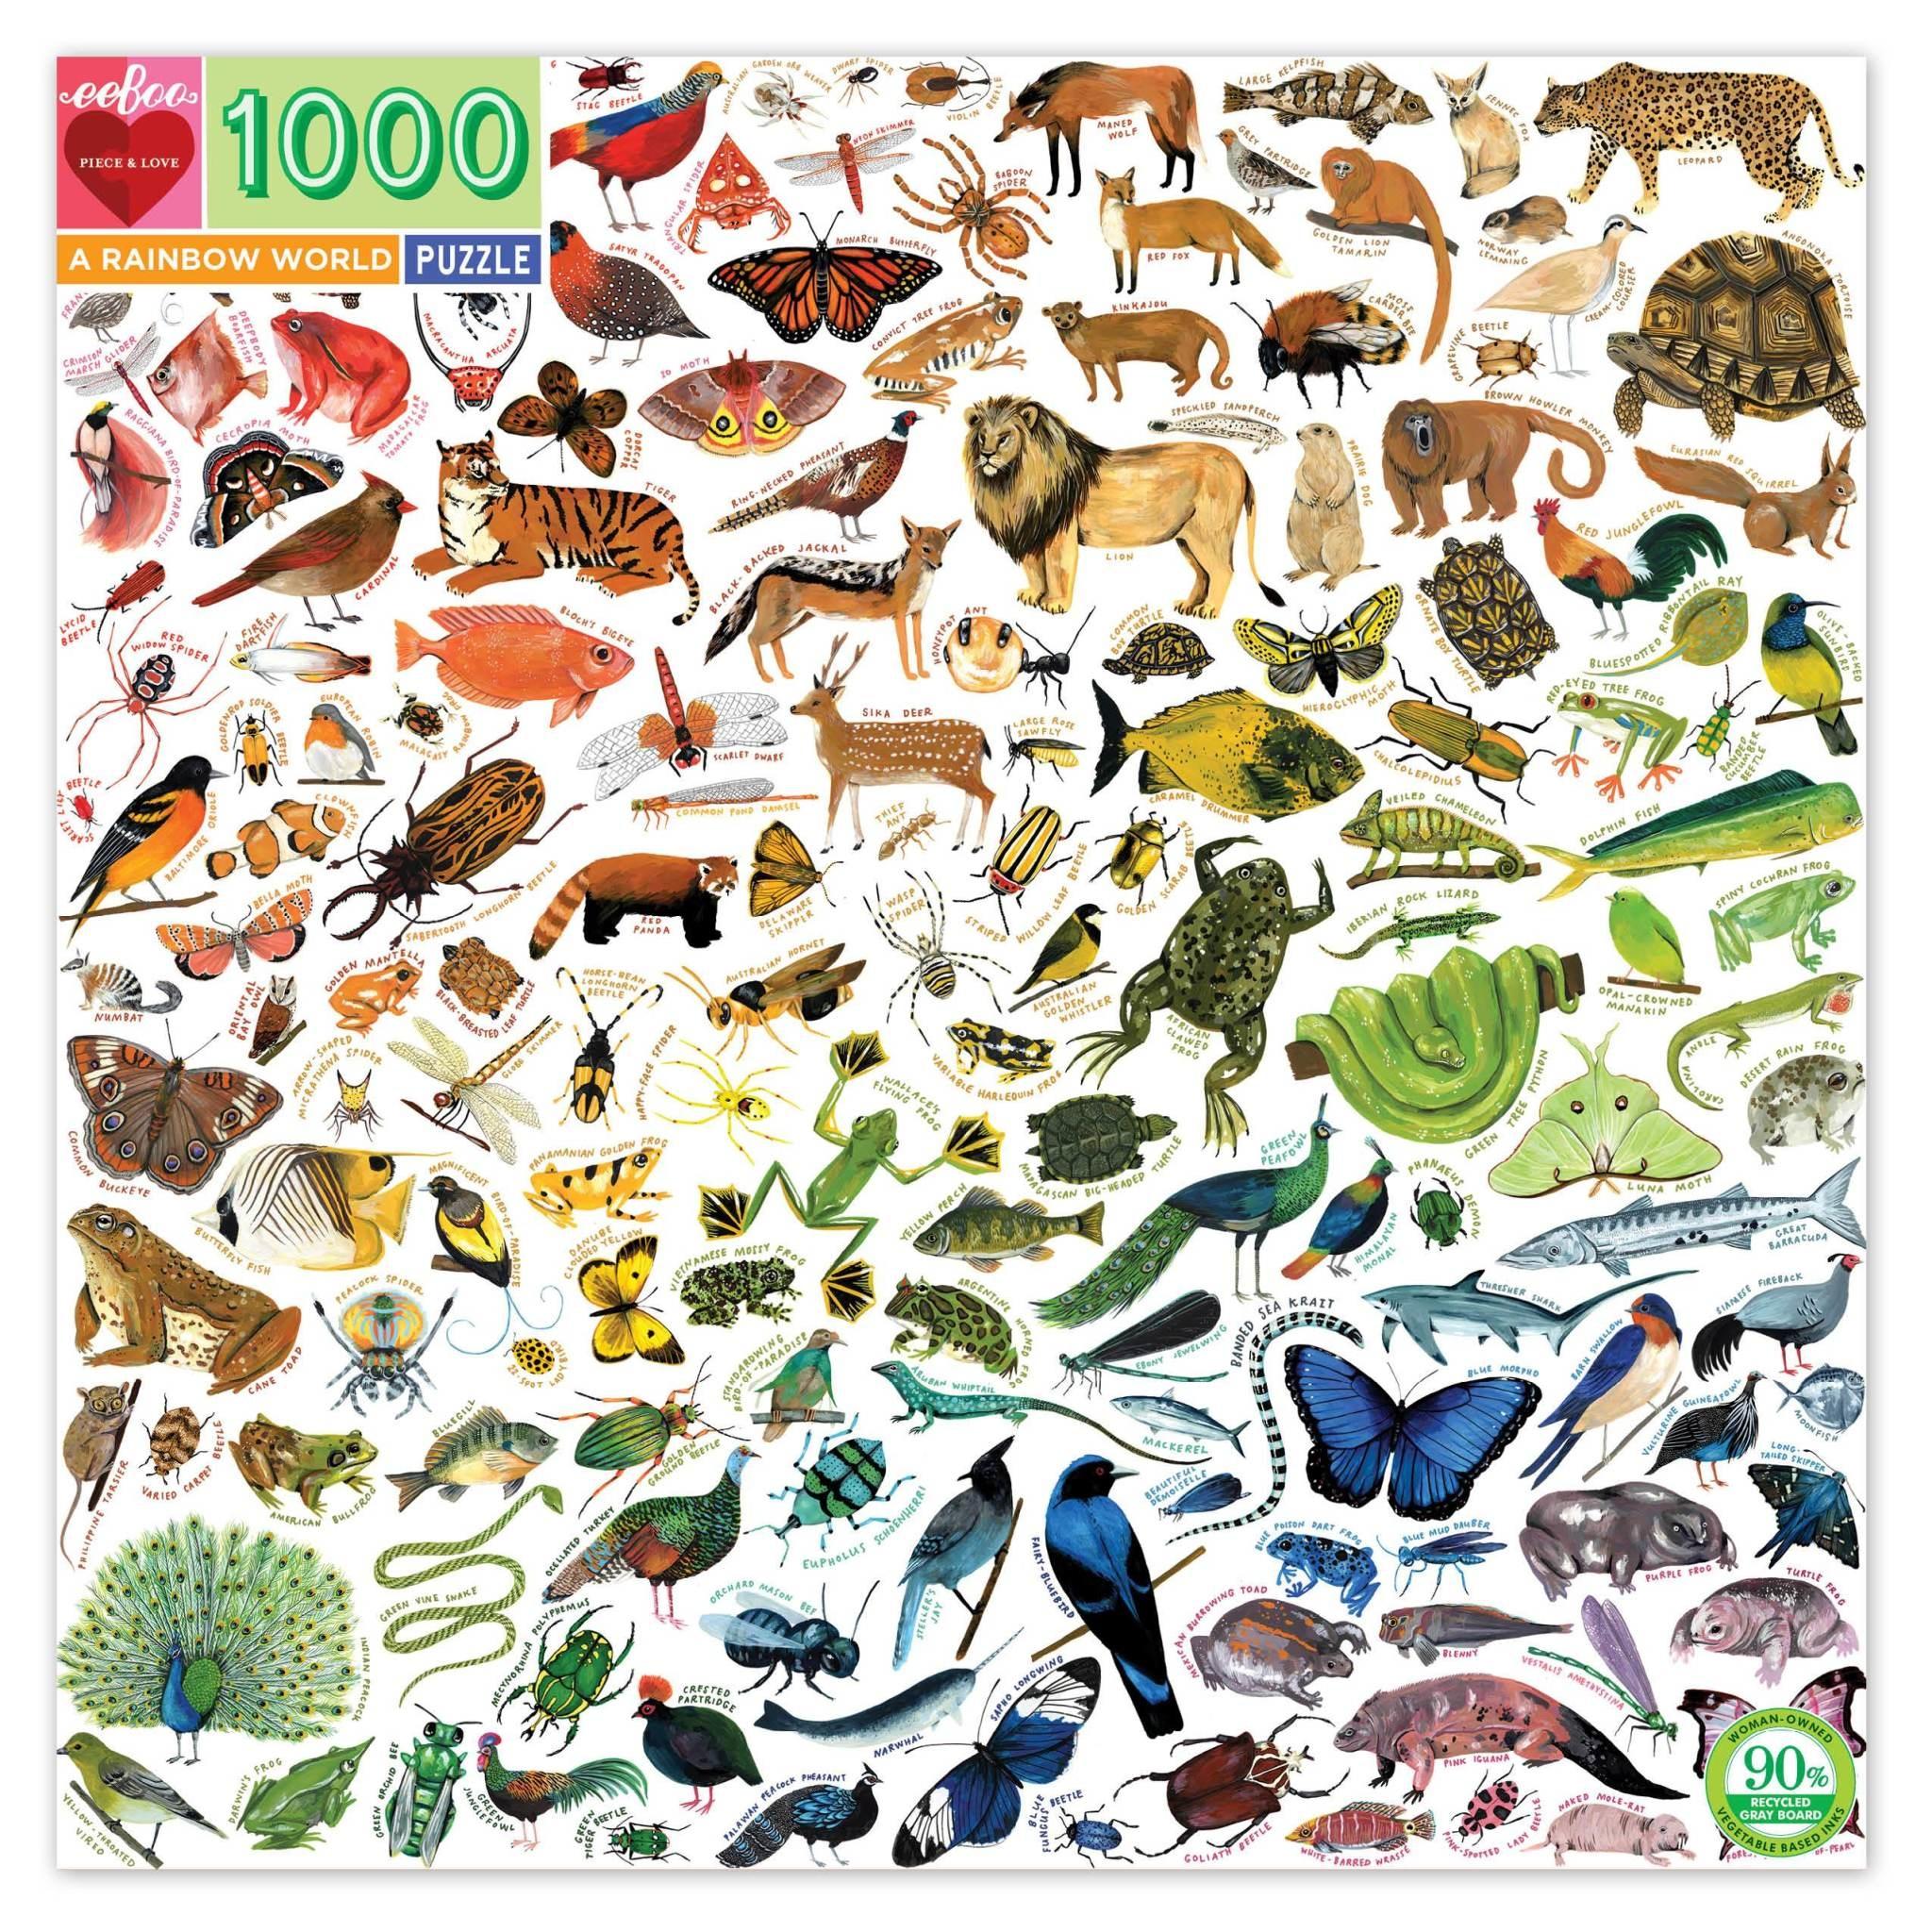 A Rainbow World (1000 Piece Puzzle)